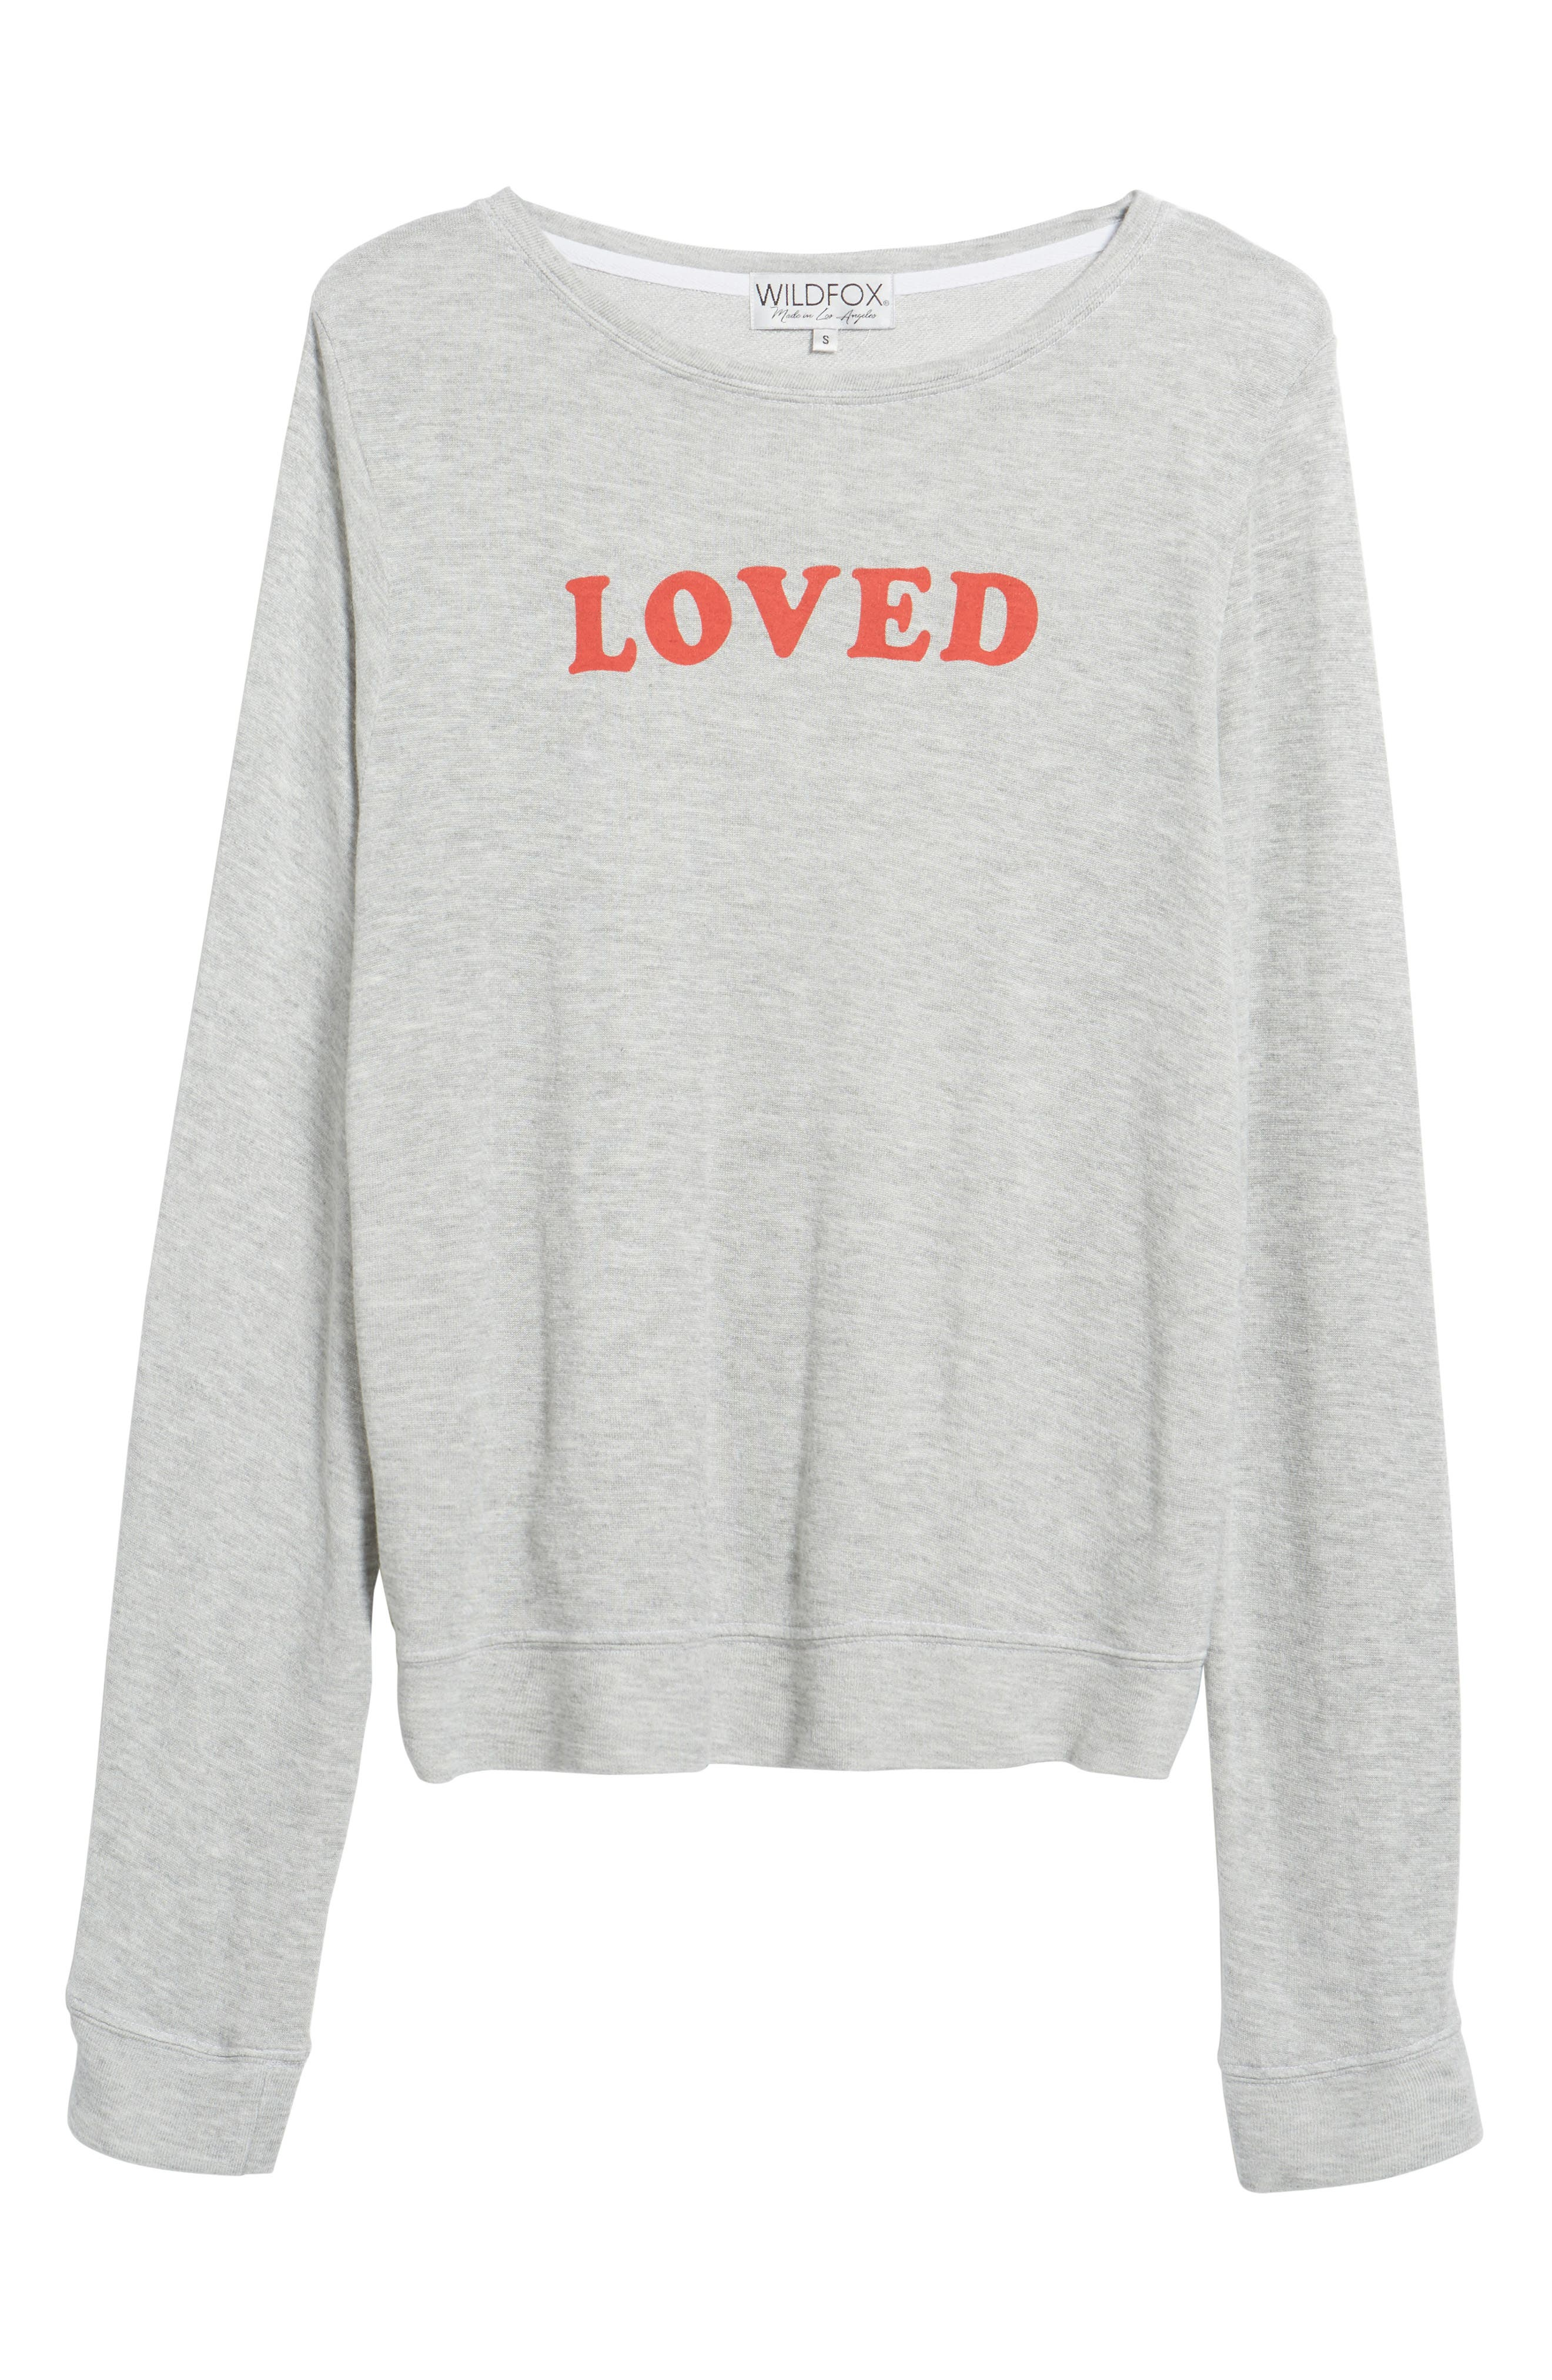 Alternate Image 6  - Wildfox Loved Sweatshirt